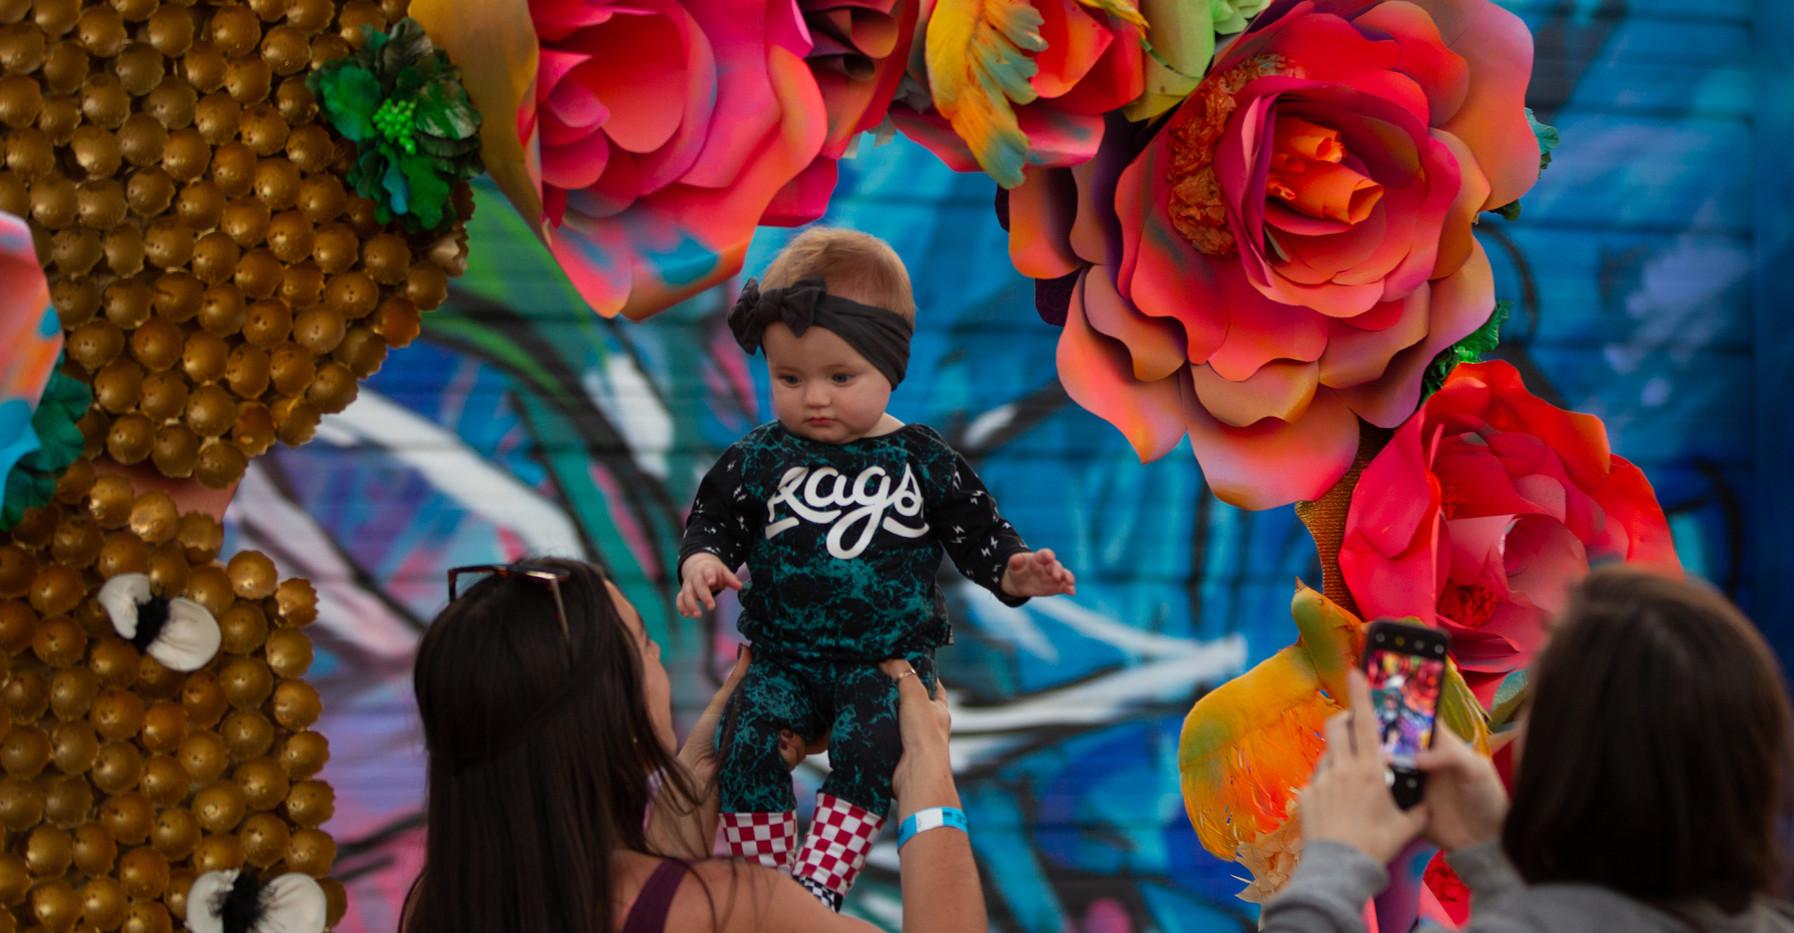 Baby underneath Billy Hensler mural